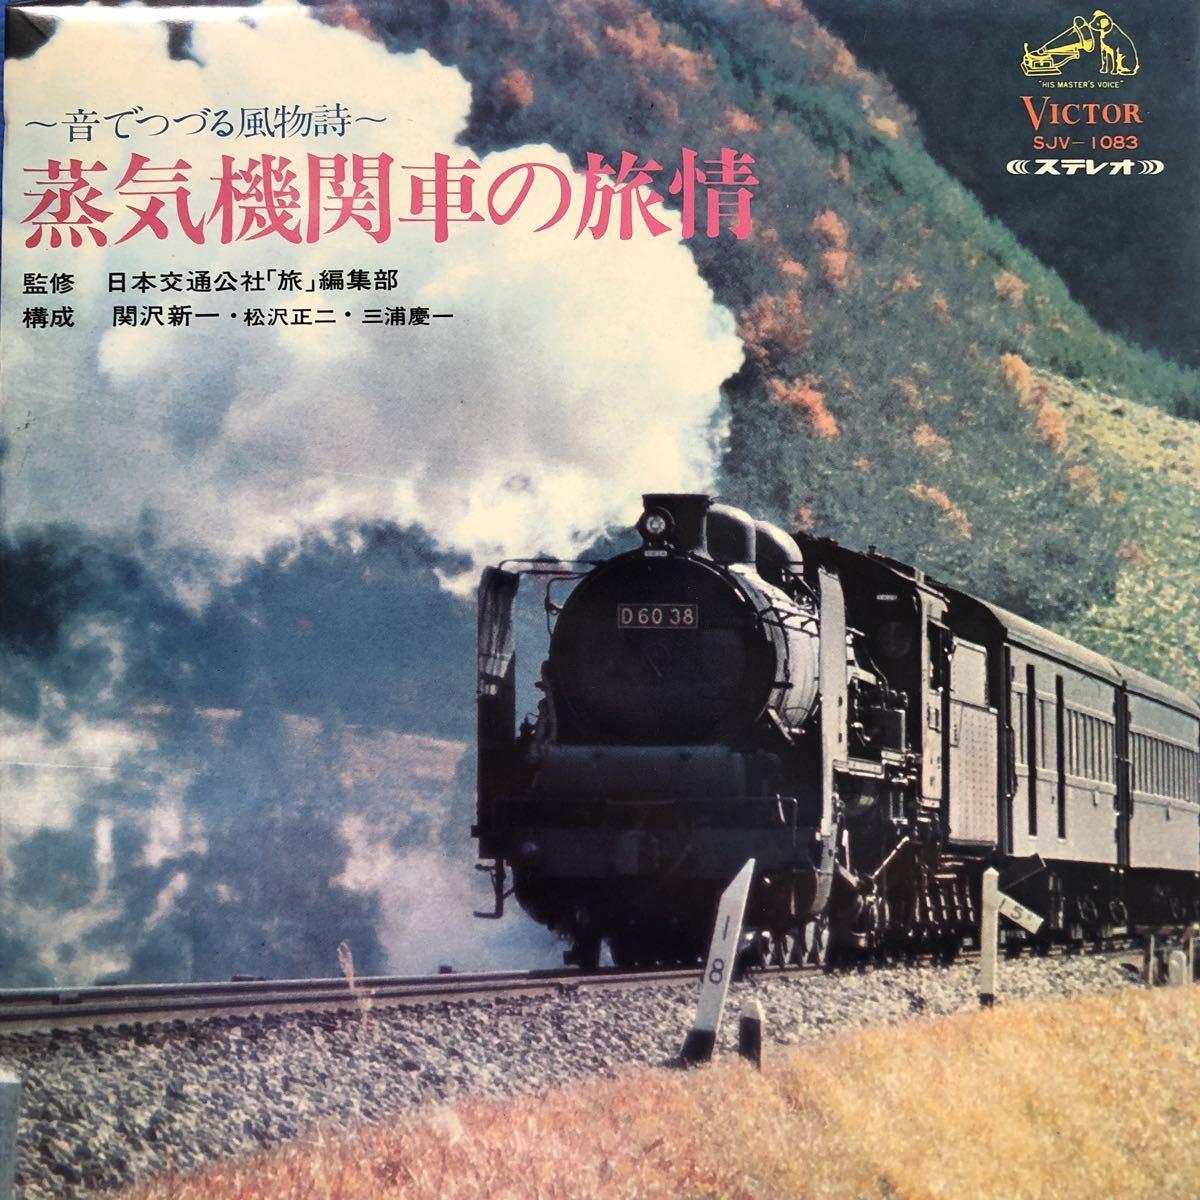 s LP ~音でつづる風物詩~ 蒸気機関車の旅情 SL D60 鉄道 国鉄 見開きジャケライナー レコード 5点以上落札で送料無料